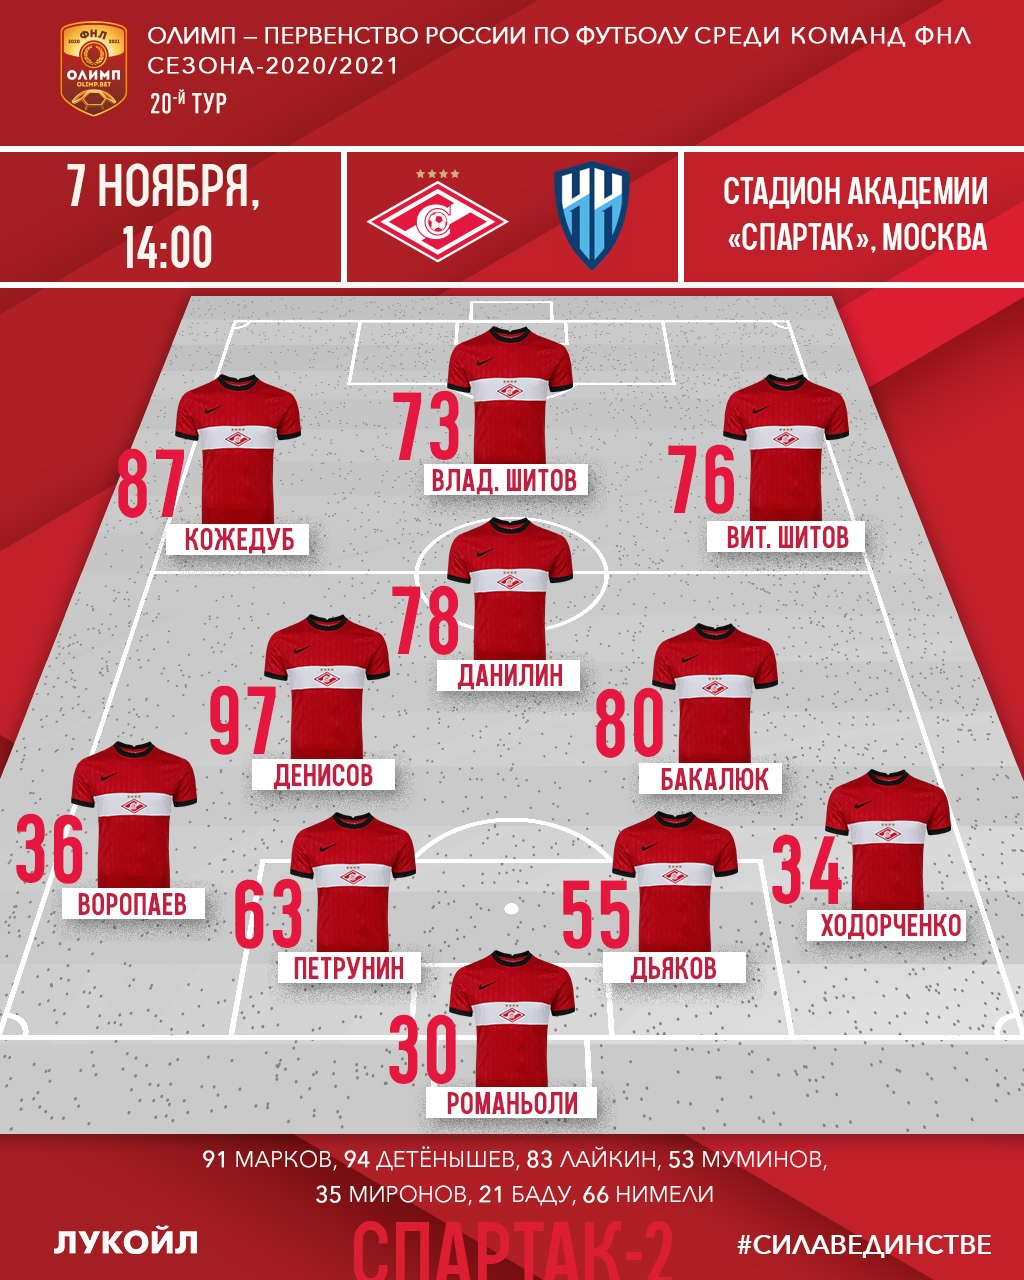 Состав «Спартака-2» на матч 20-го тура ФНЛ «Нижний Новгород»